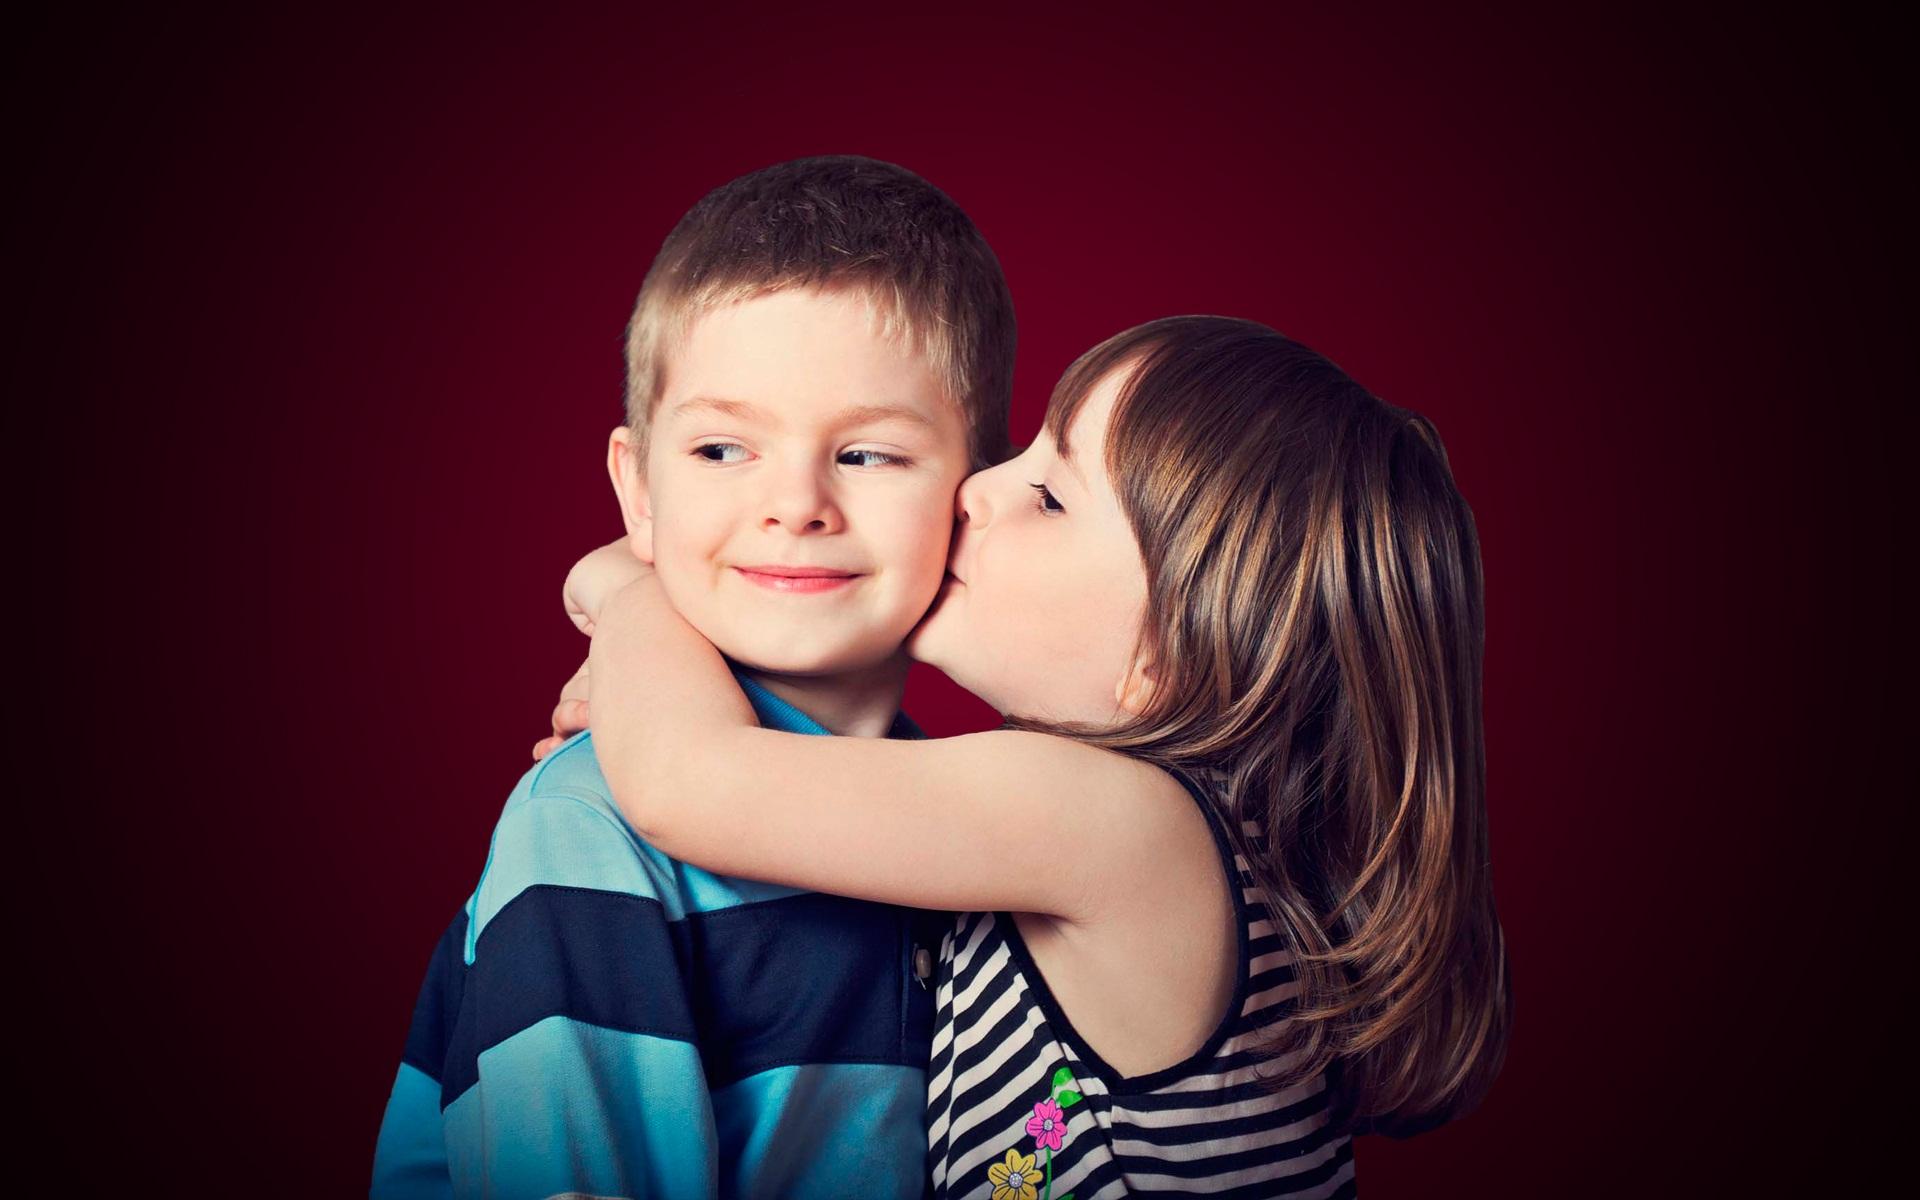 Little cute baby hug and kissing Beautiful hd wallpaper 1920x1200